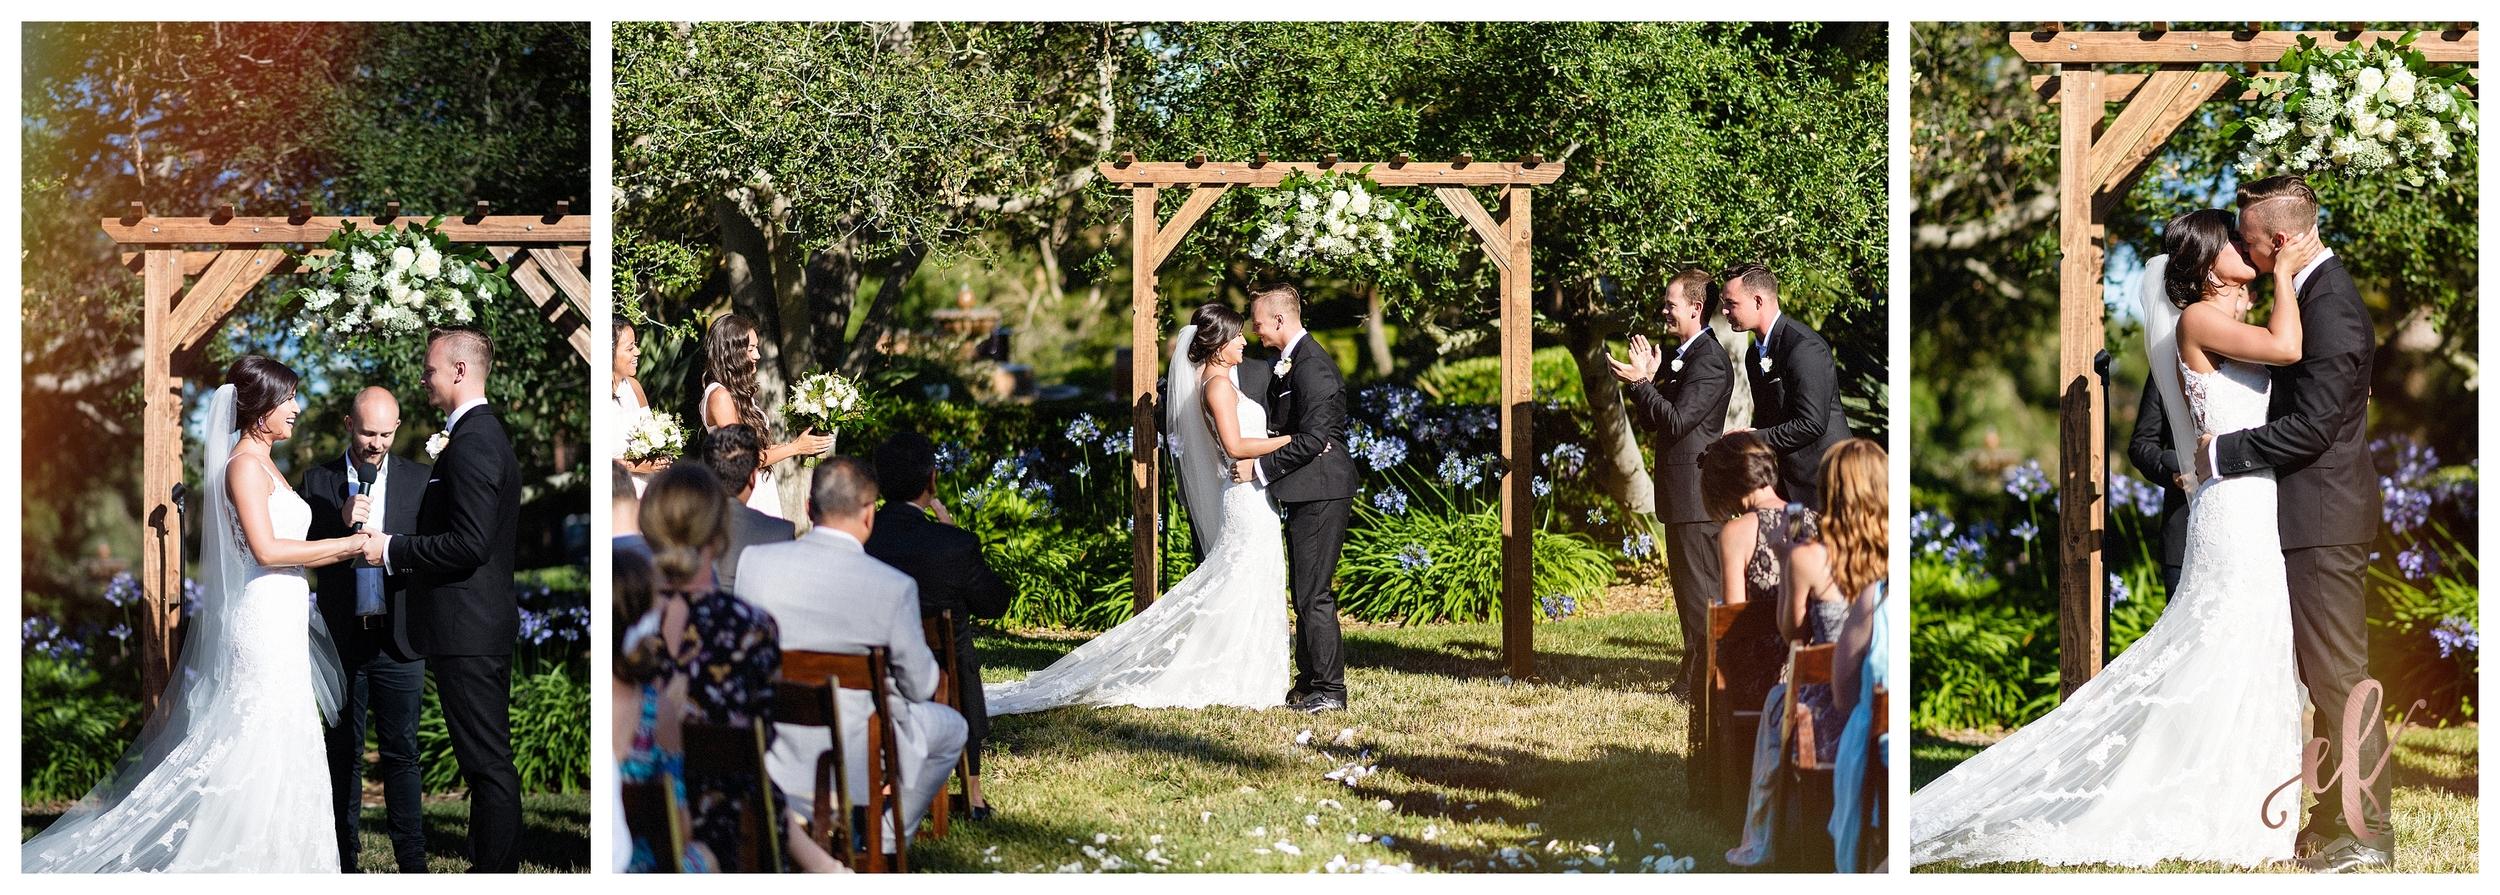 San Diego Wedding Photographer   Ernie & Fiona Photography   First Kiss